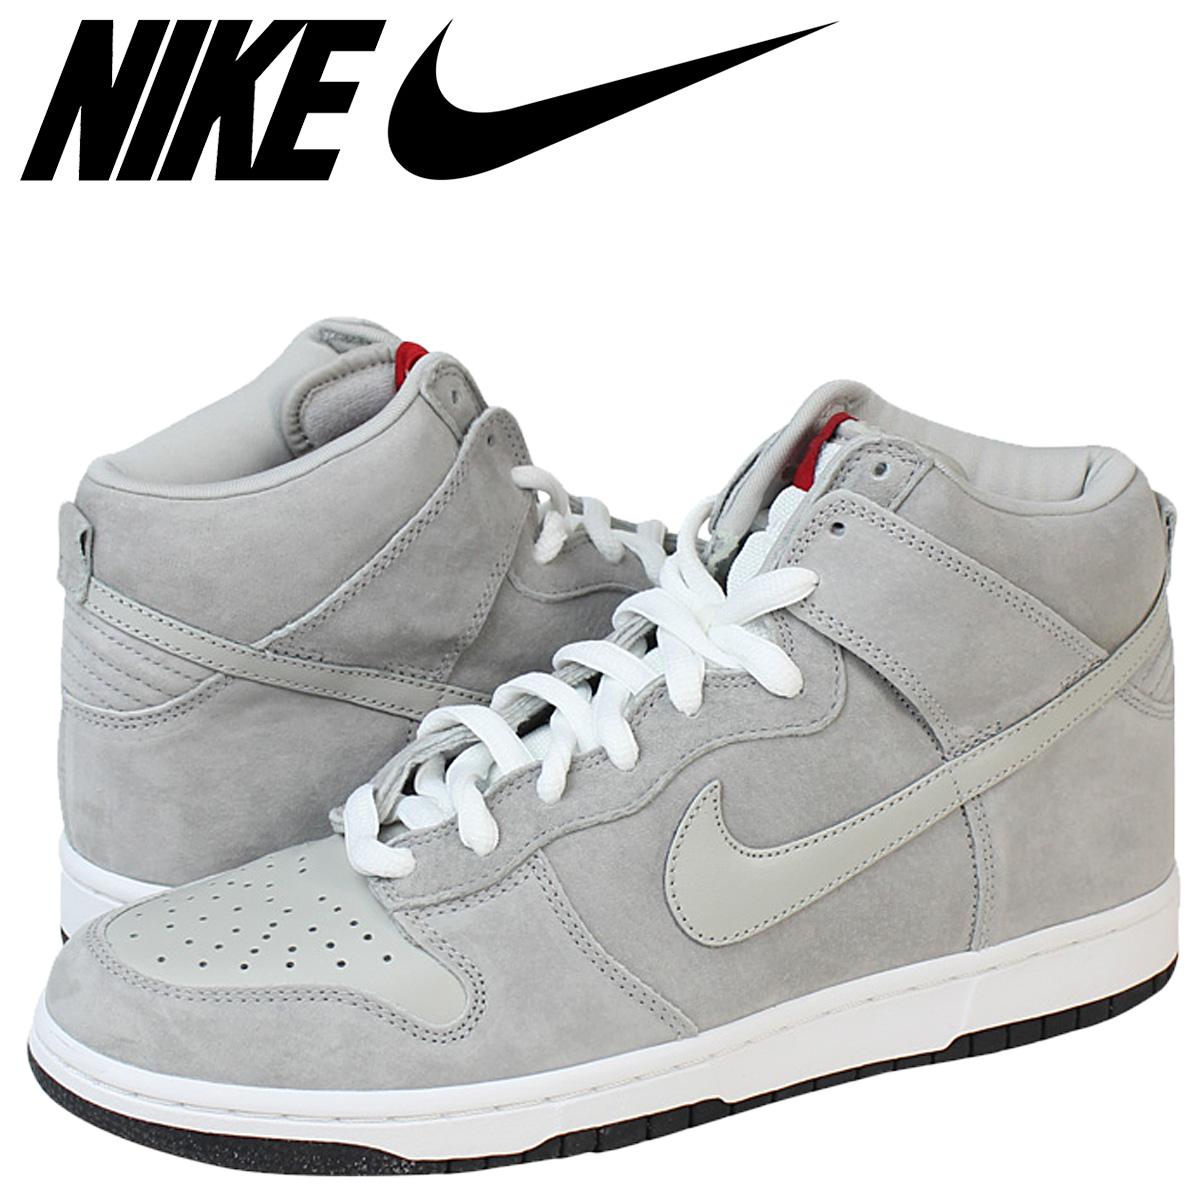 best service 62970 429ef Nike NIKE dunk sneakers PEE-WEE DUNK HIGH SB Dunk high SB 305050-004 grey  mens